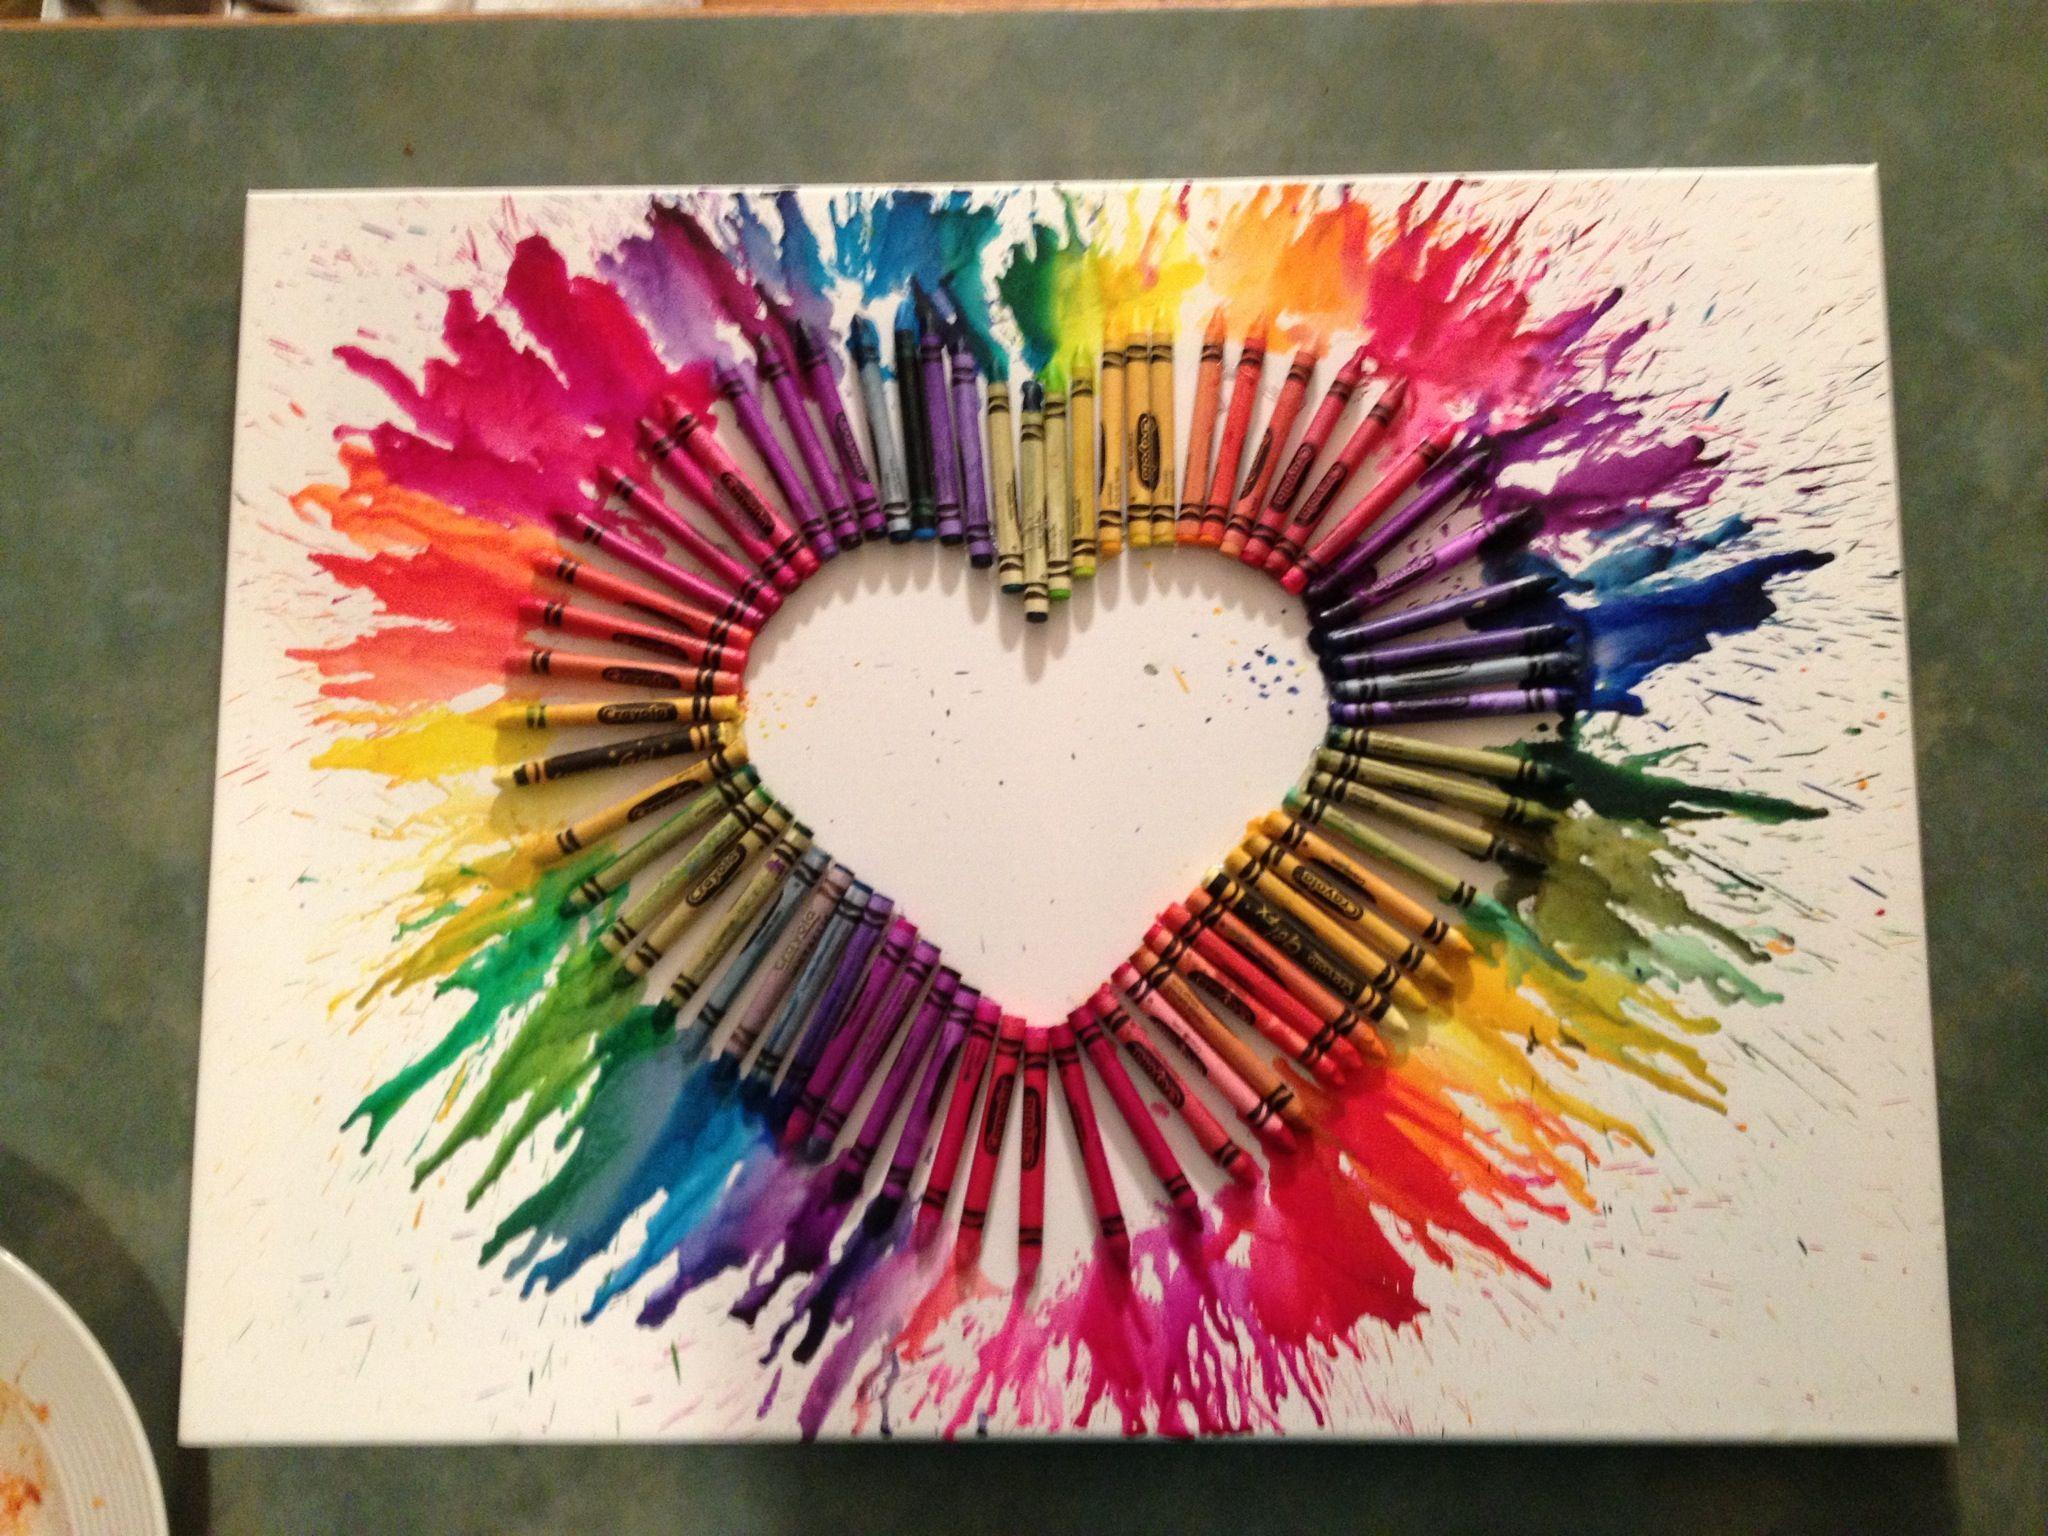 Crayon Art Arts And Crafts Project